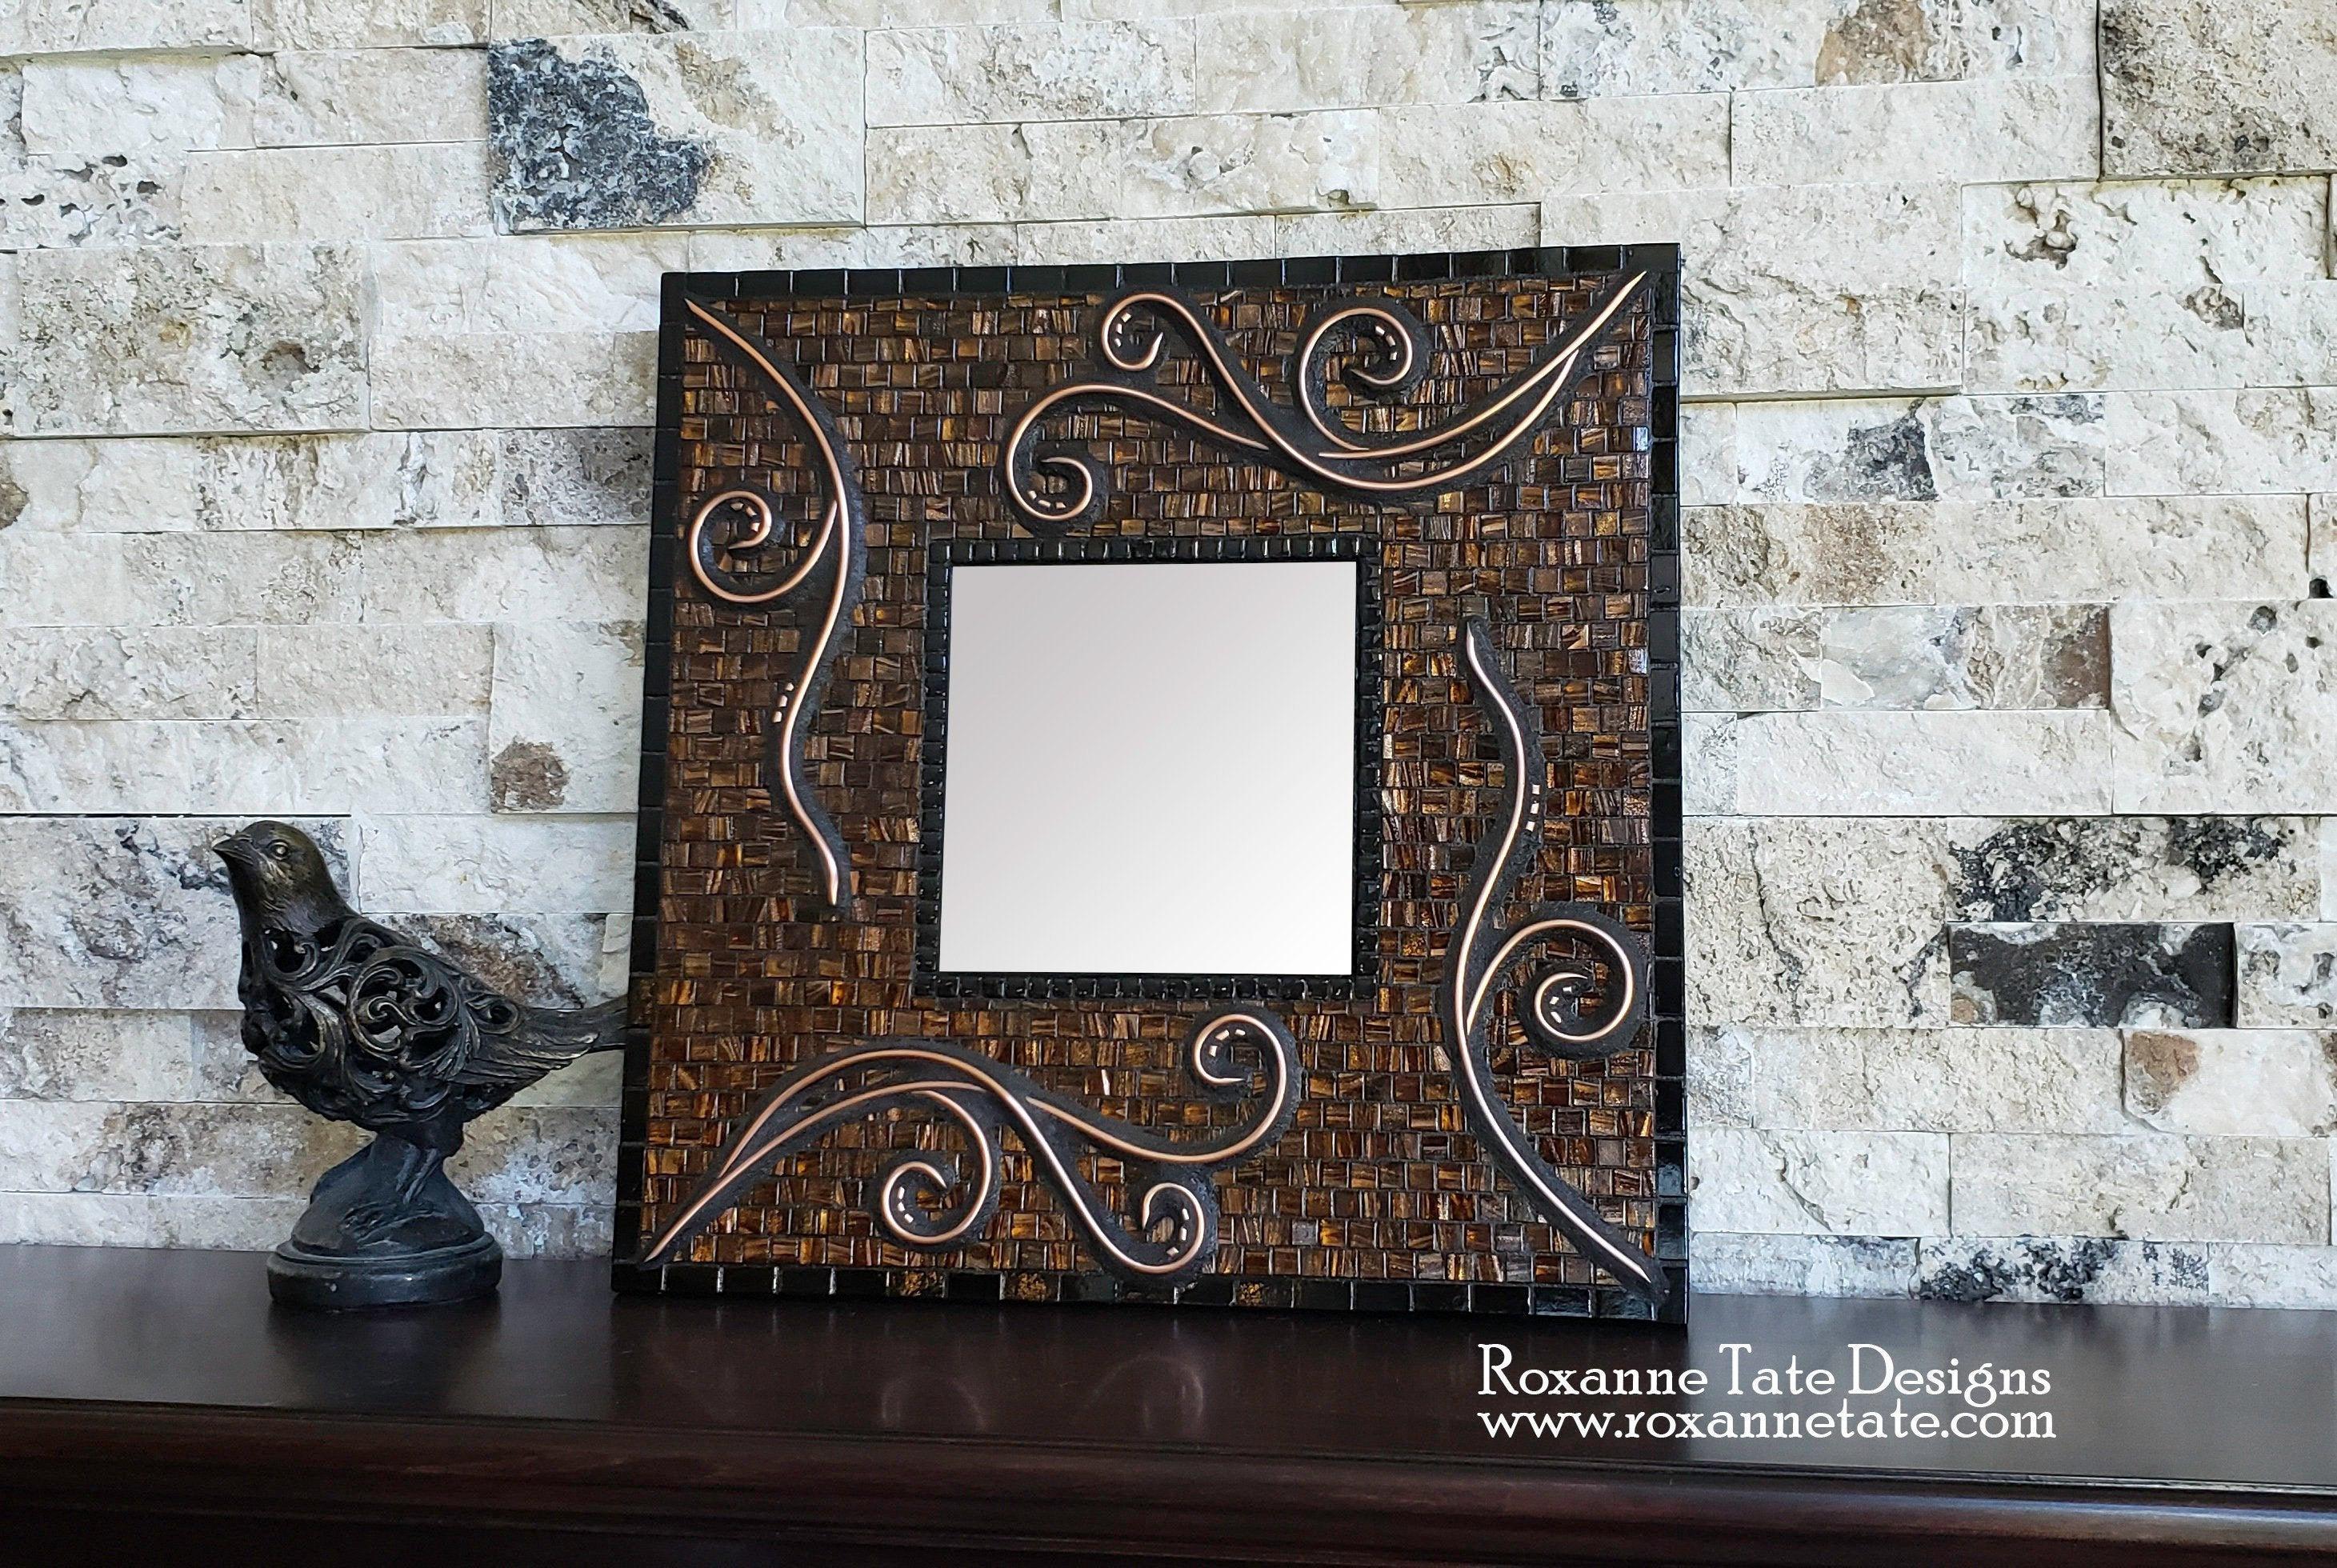 Unique Mosaic Mirror, Accent Mirror, Wall Mirror, Small Mosaic Mirror,  Mirror Wall Decor, Bathroom Decor, Powder Bath Decor, Copper, Mosaic for Rena Accent Mirrors (Image 28 of 30)